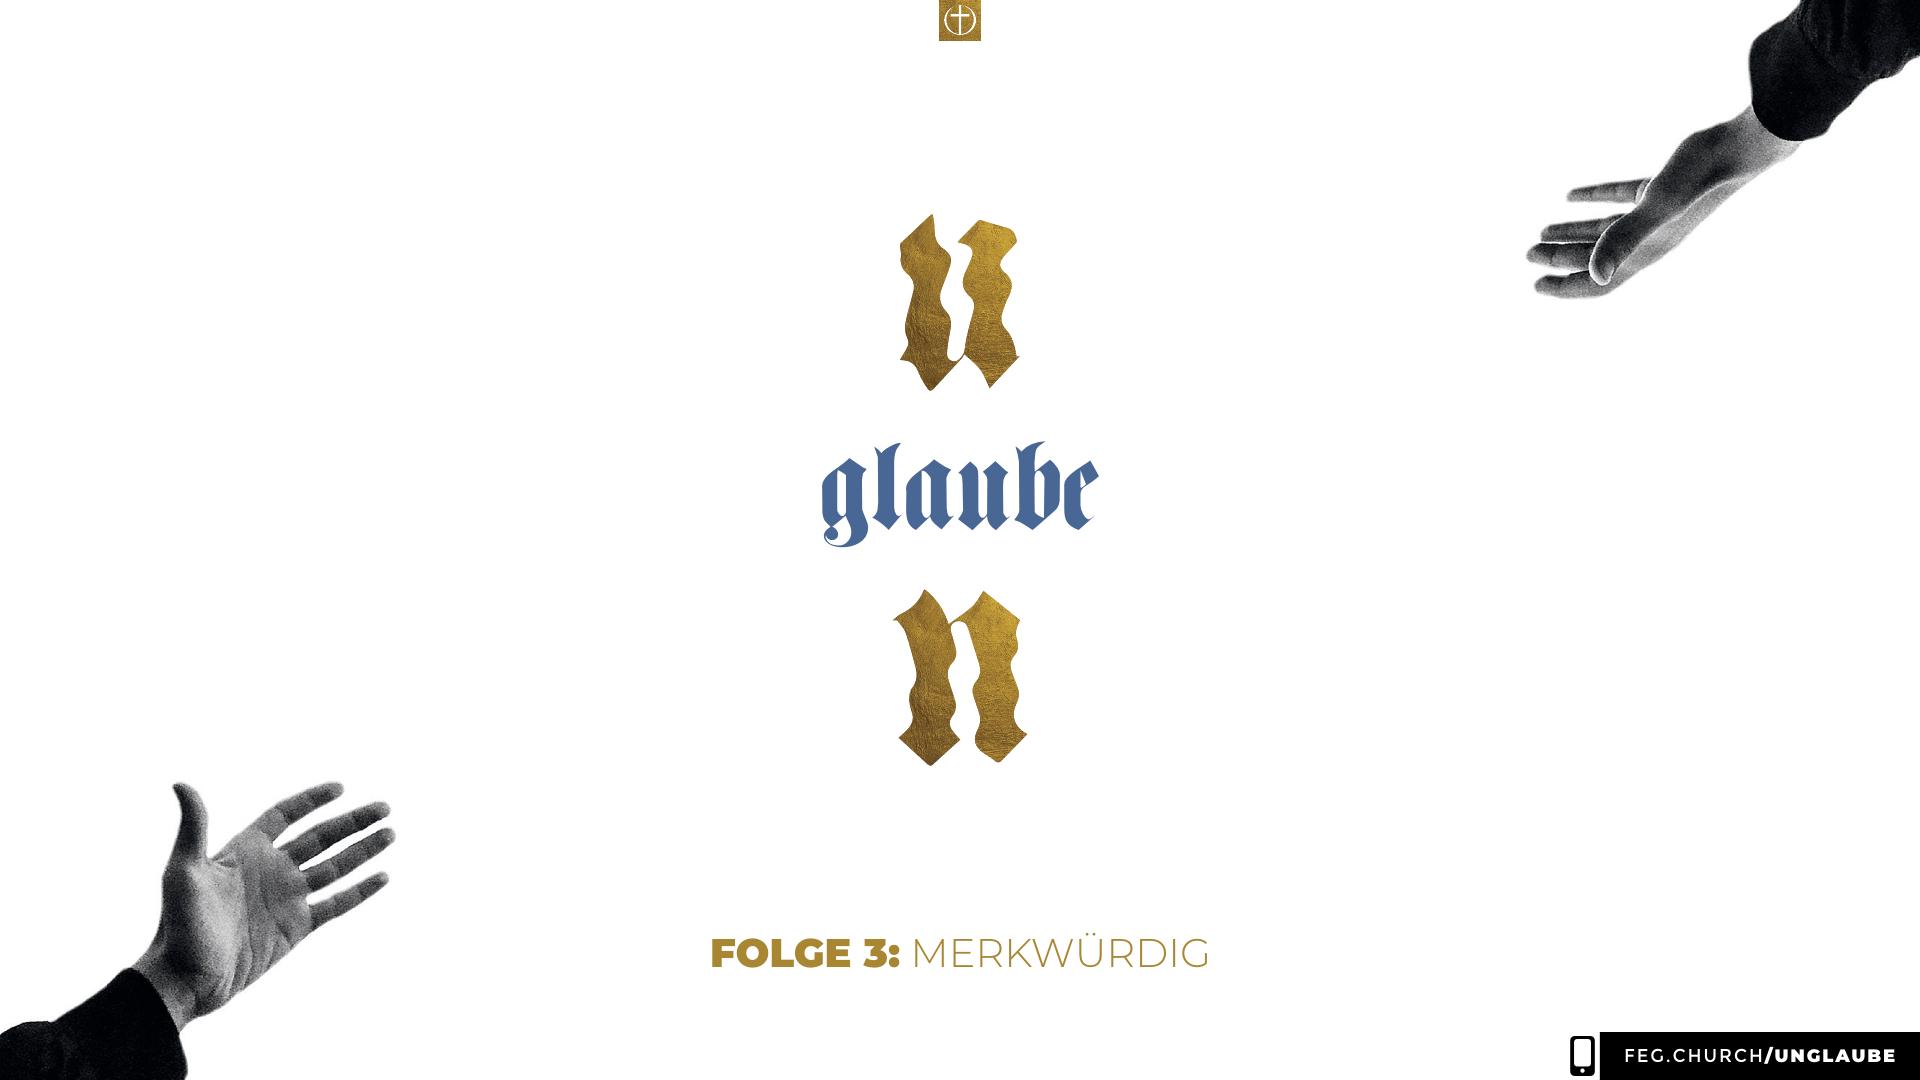 UN/GLAUBE – Folge 3: merkwürdig